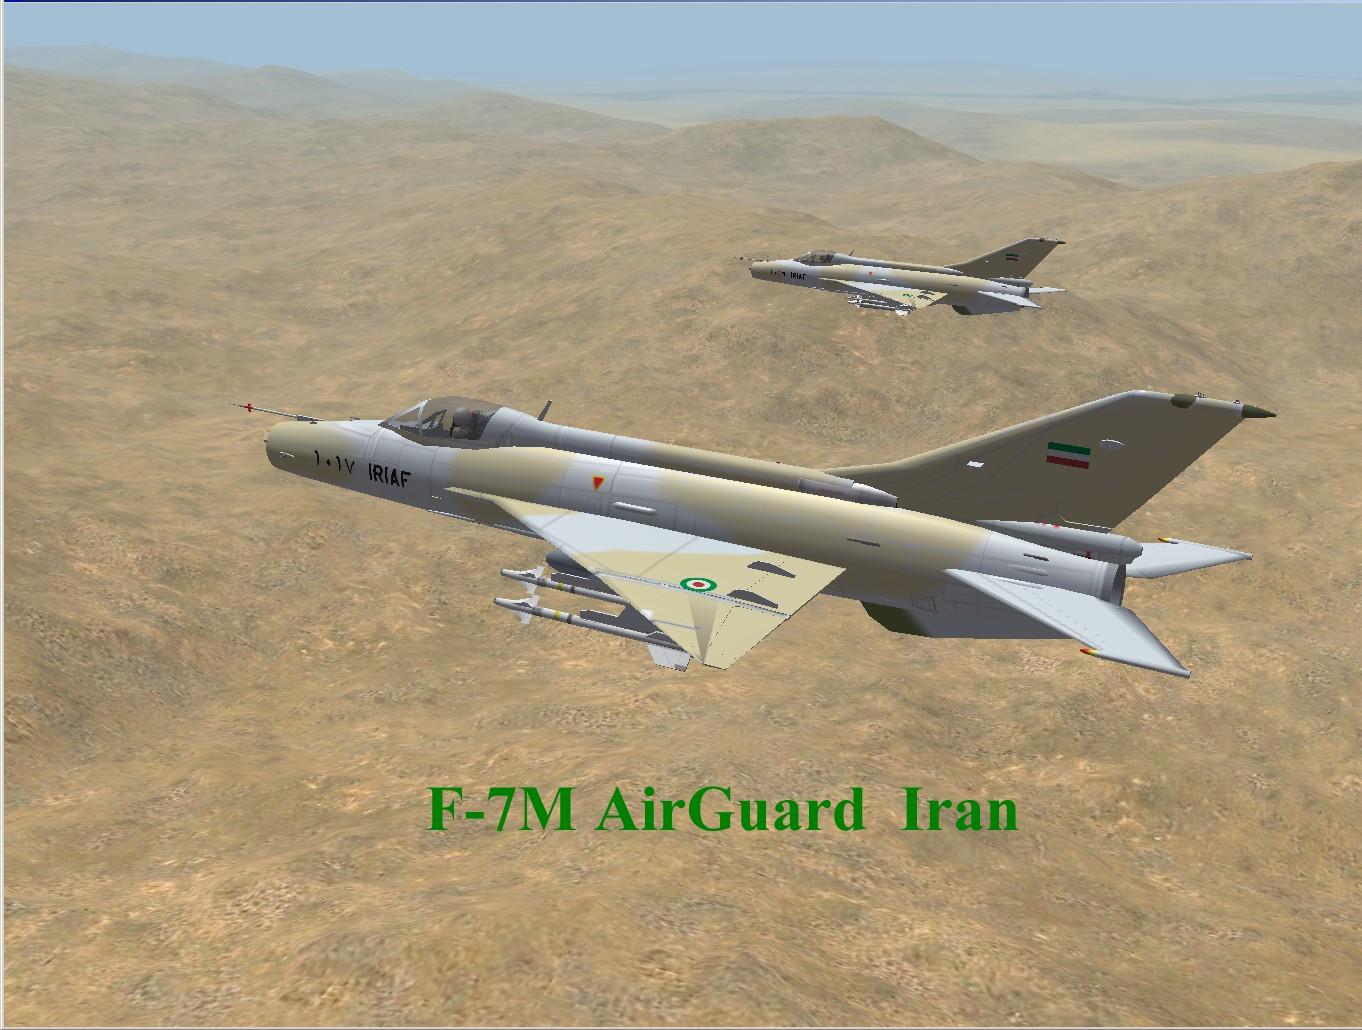 F-7M AirGuard (Iran) for WOI,WOE